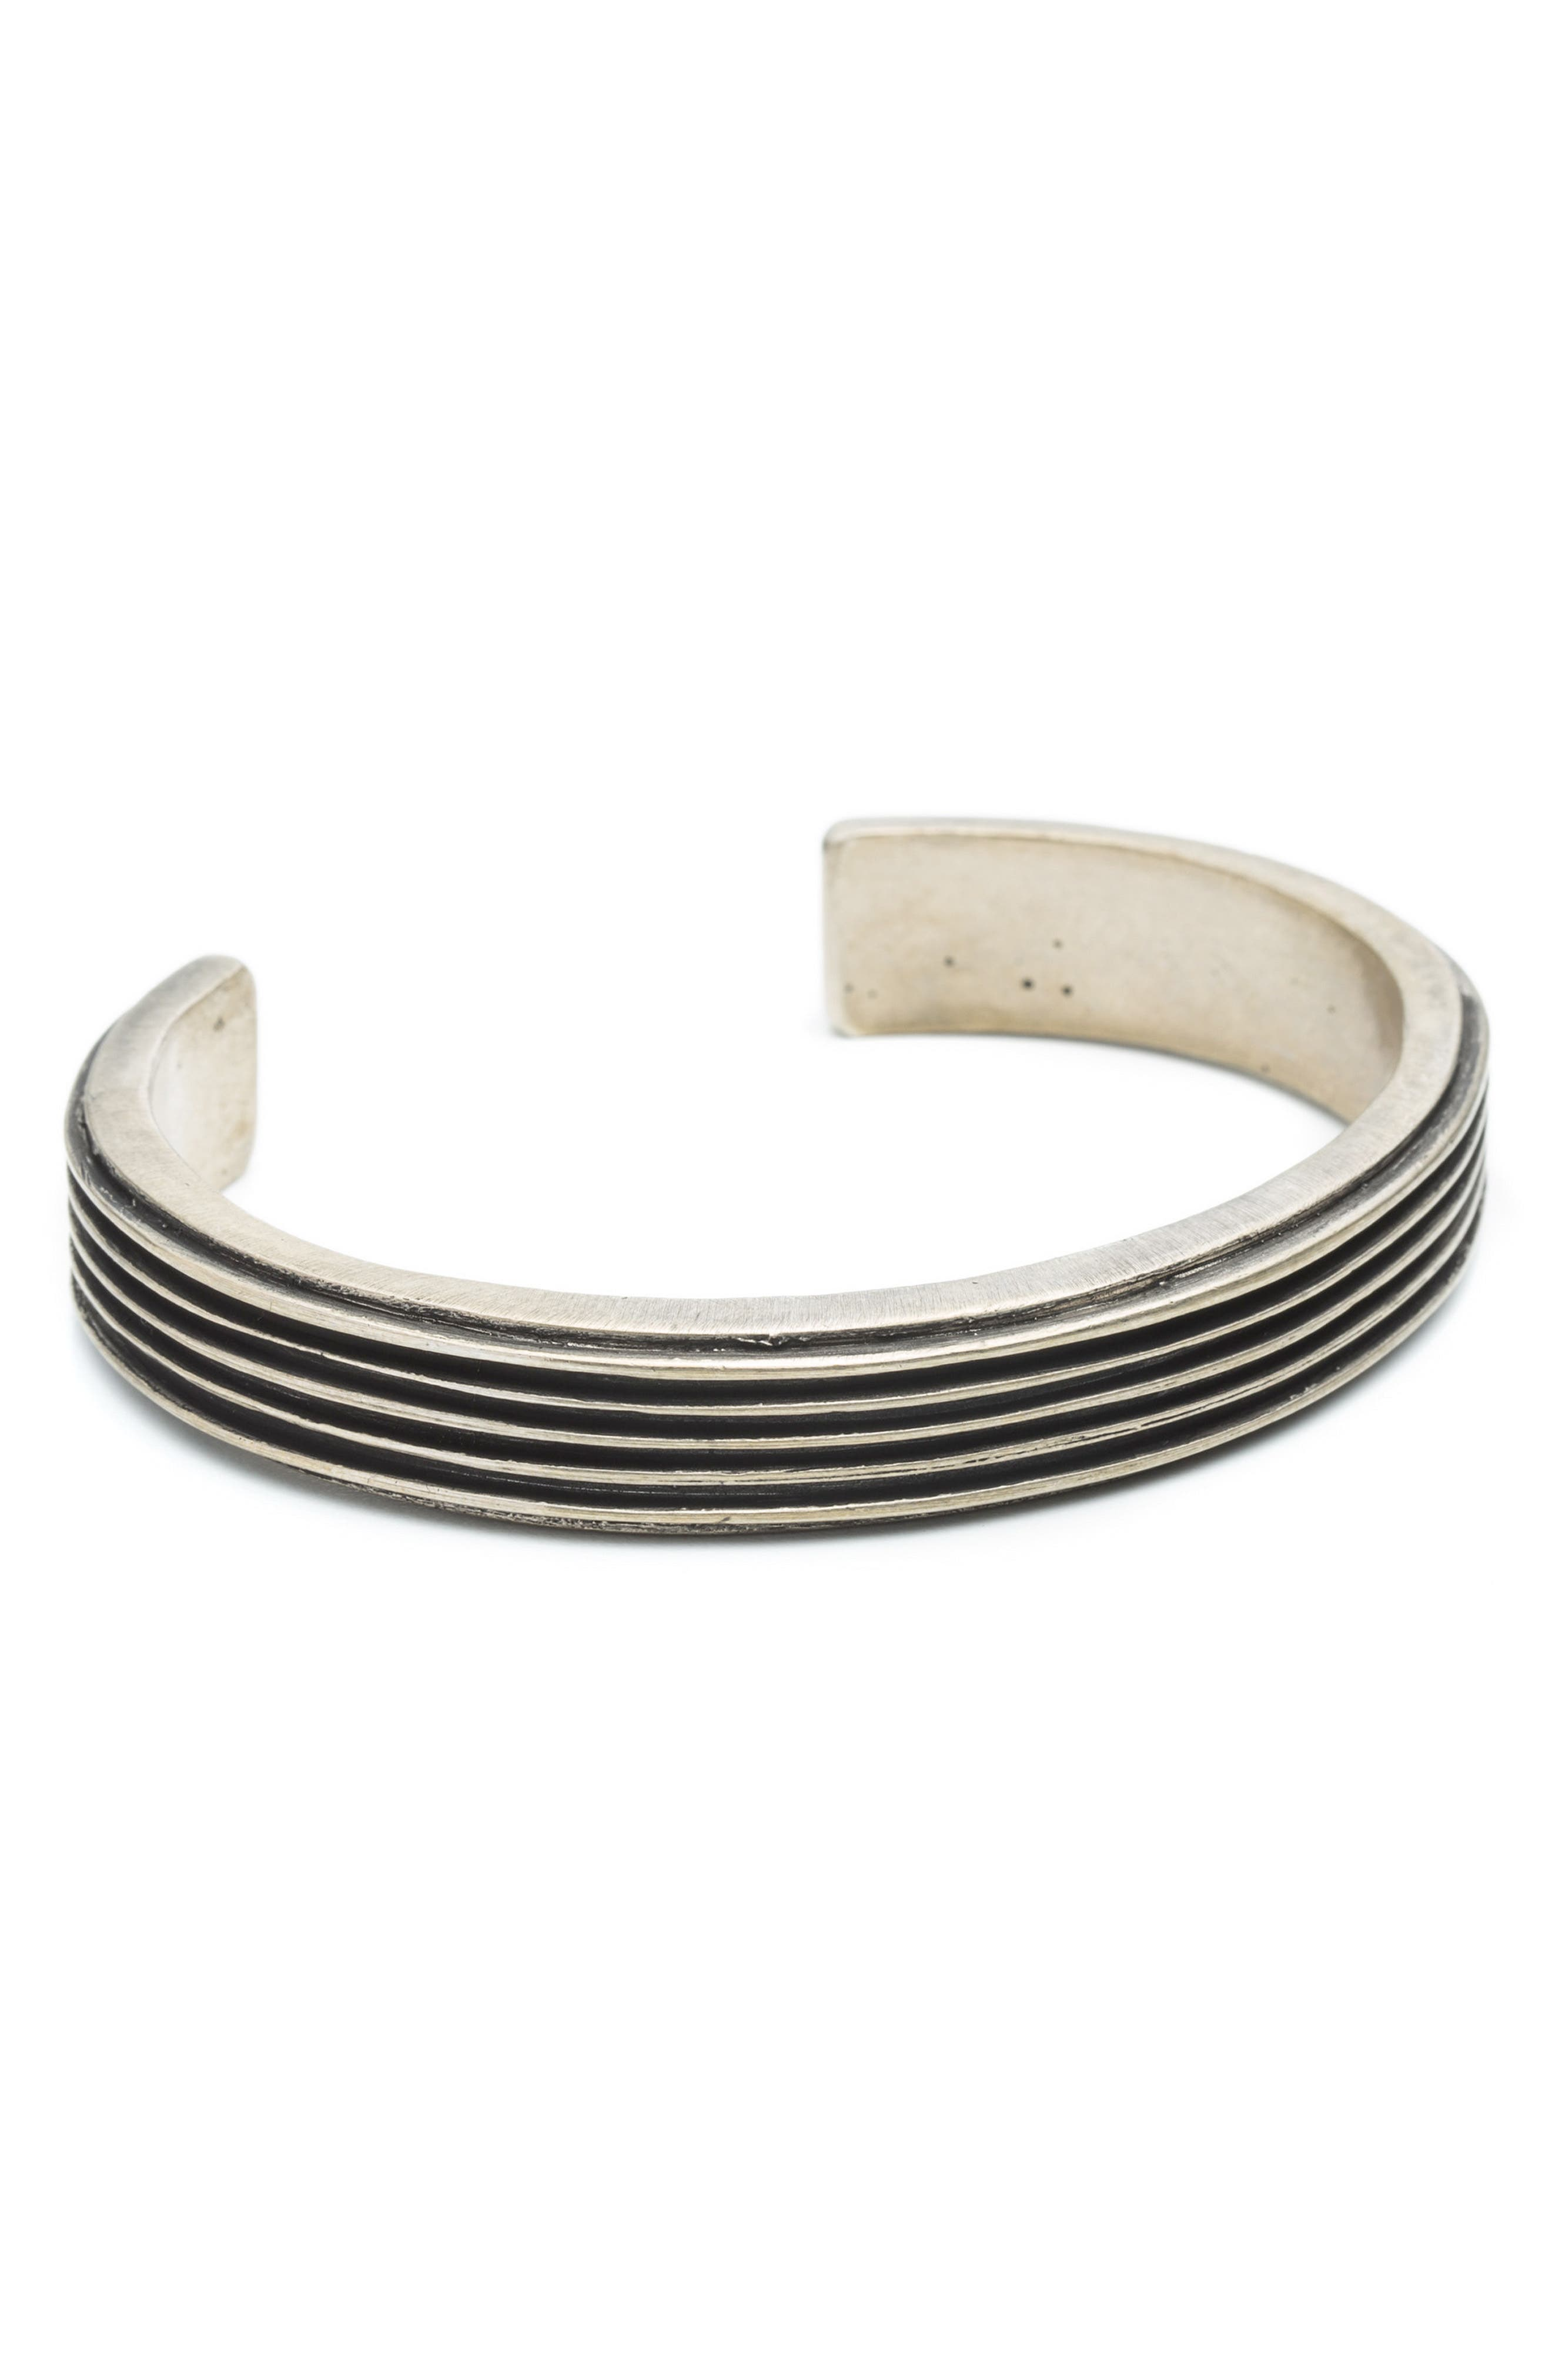 Ridge Cuff Bracelet,                             Main thumbnail 1, color,                             040